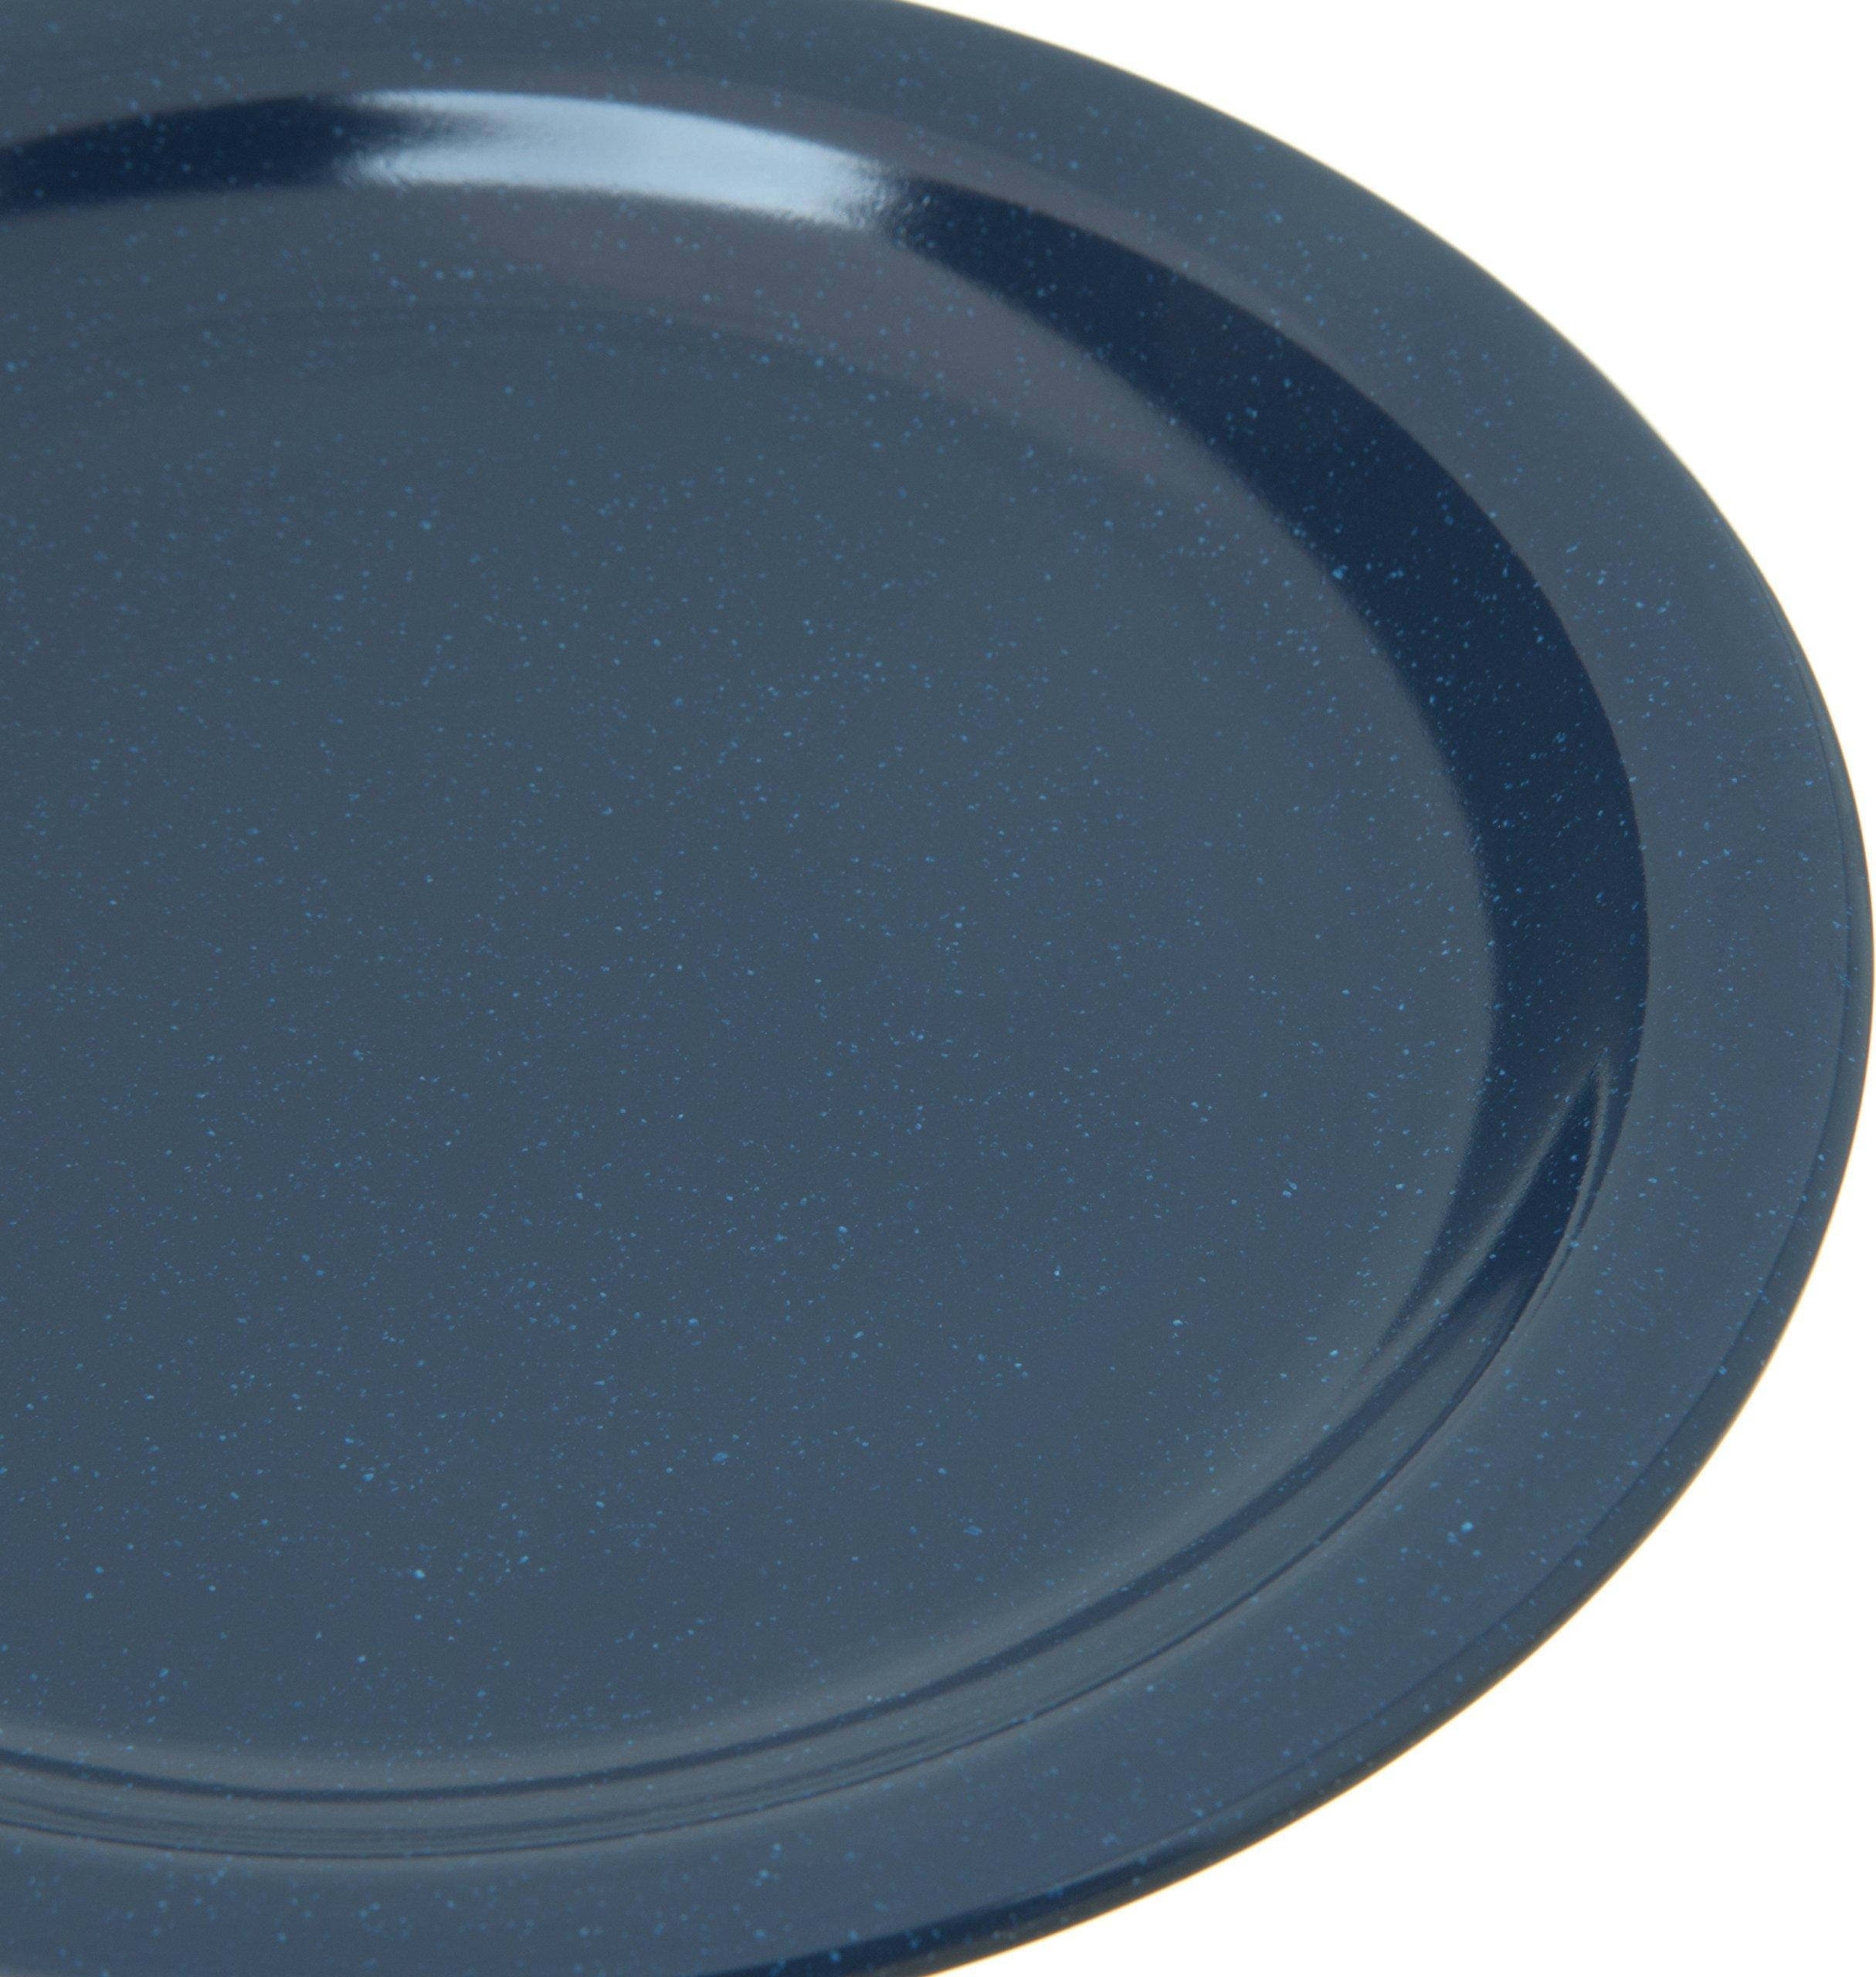 Carlisle 4350335 Dallas Ware Melamine Salad Plate, 7.19'' Diameter x 0.74'' Height, Café Blue (Case of 48) by Carlisle (Image #1)